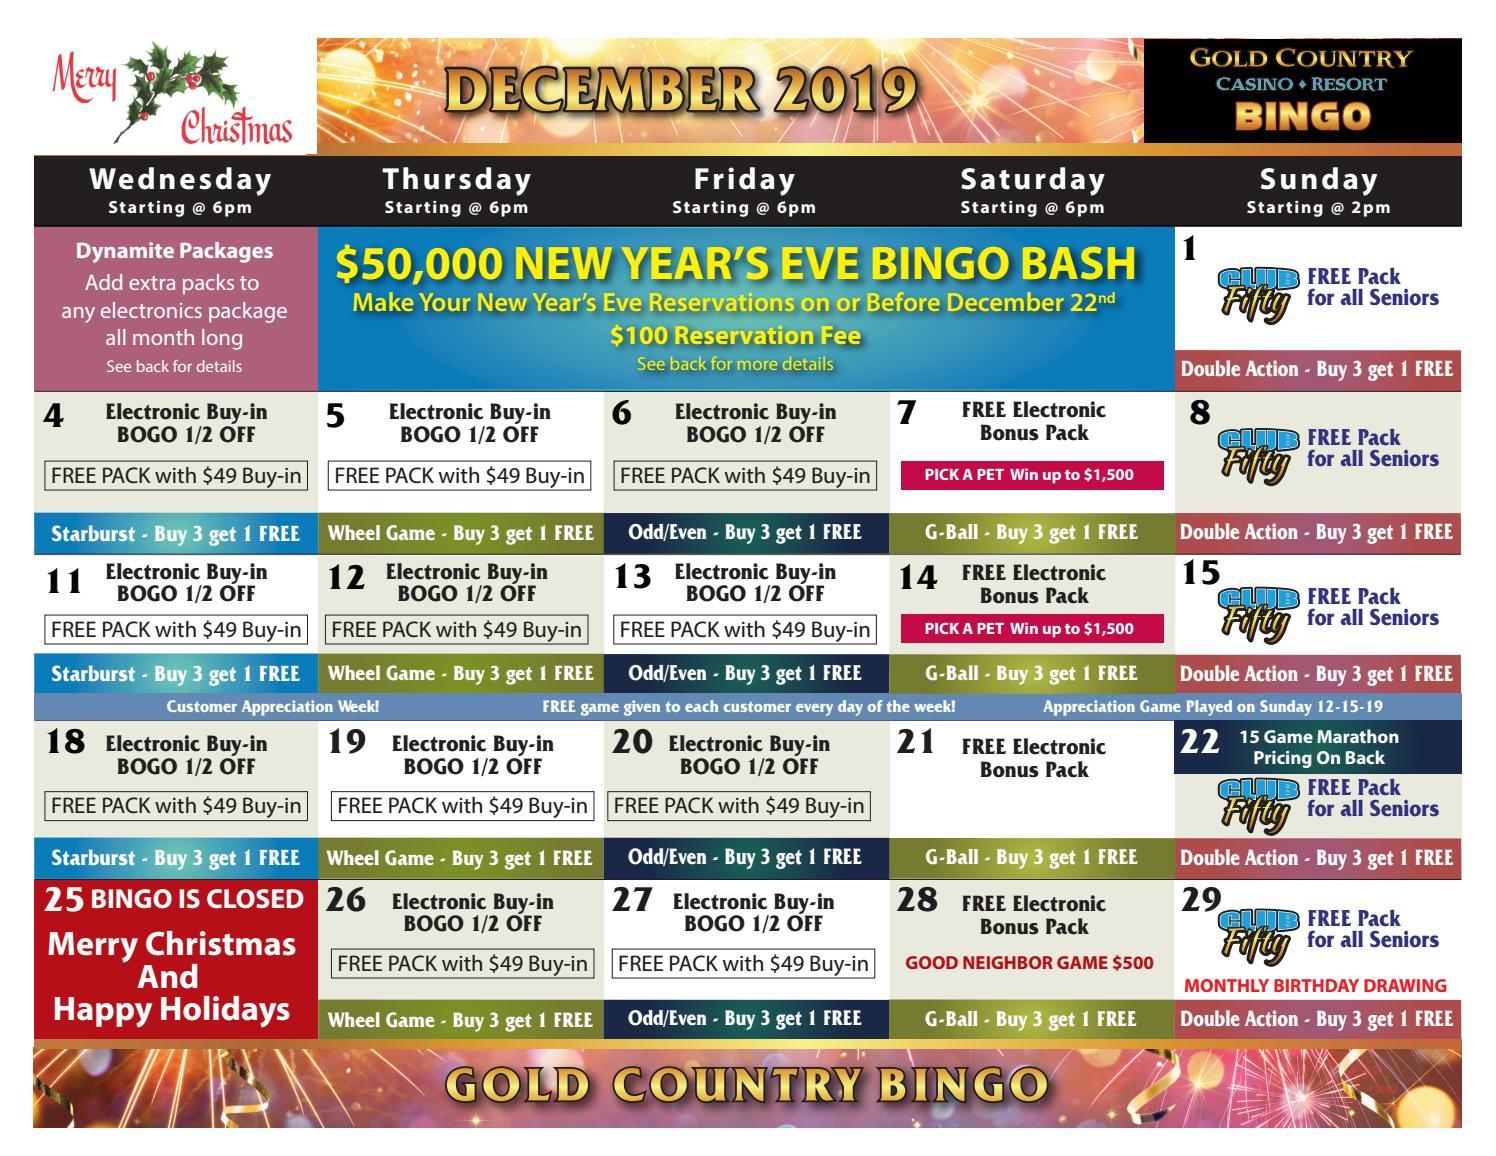 Drueckglueck casino 20 free spins